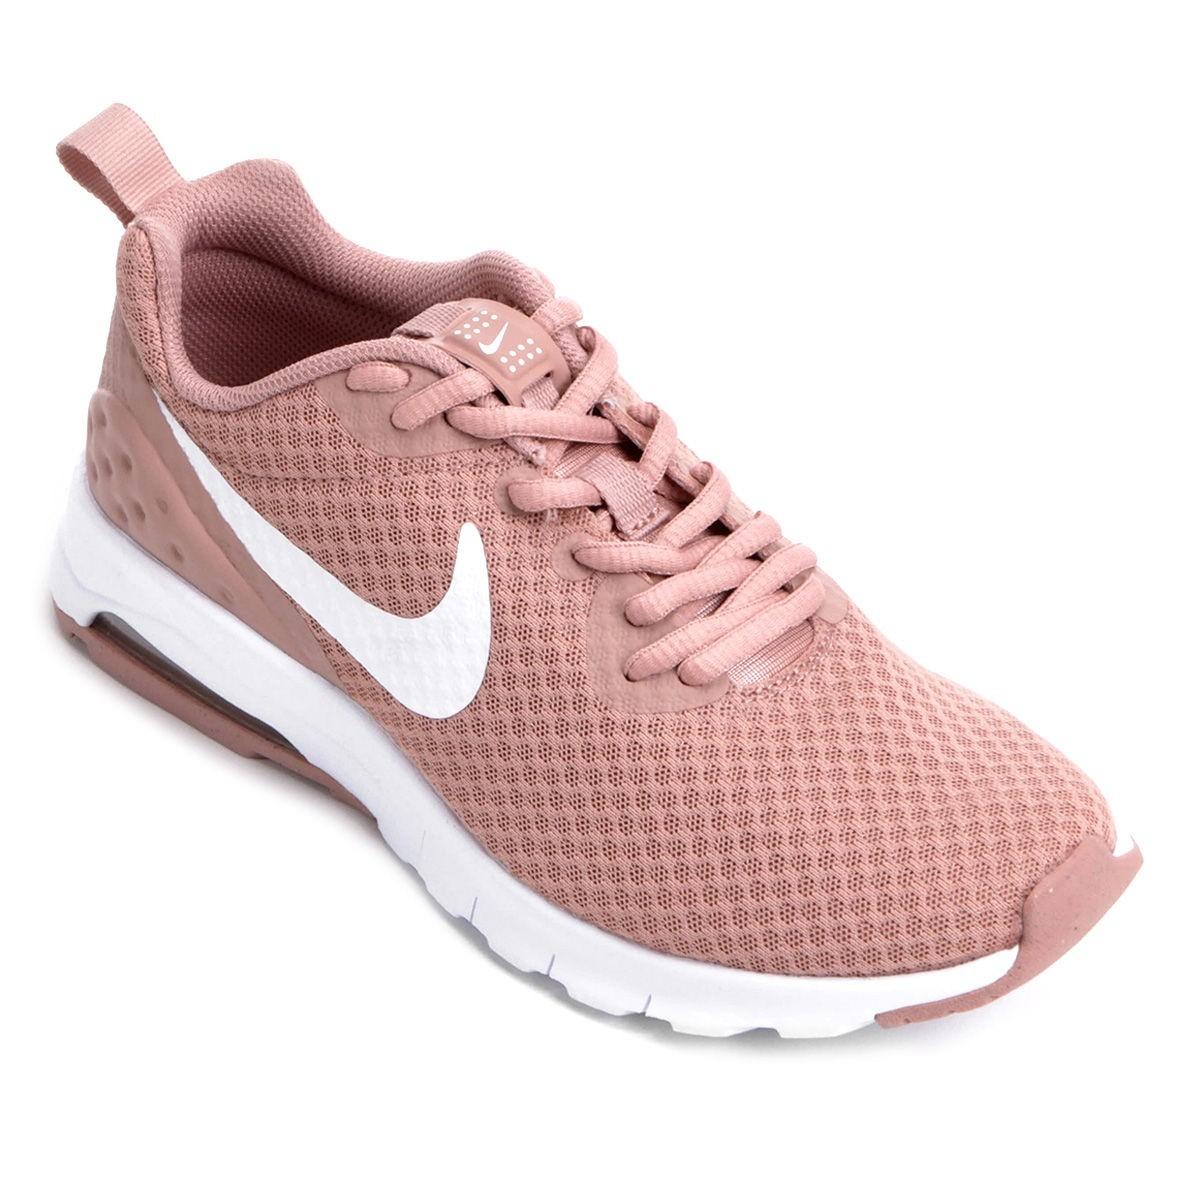 1d776203aa2 ... netherlands tênis nike air max motion lw feminino rosa branco.  carregando zoom. a717b 1dfd5